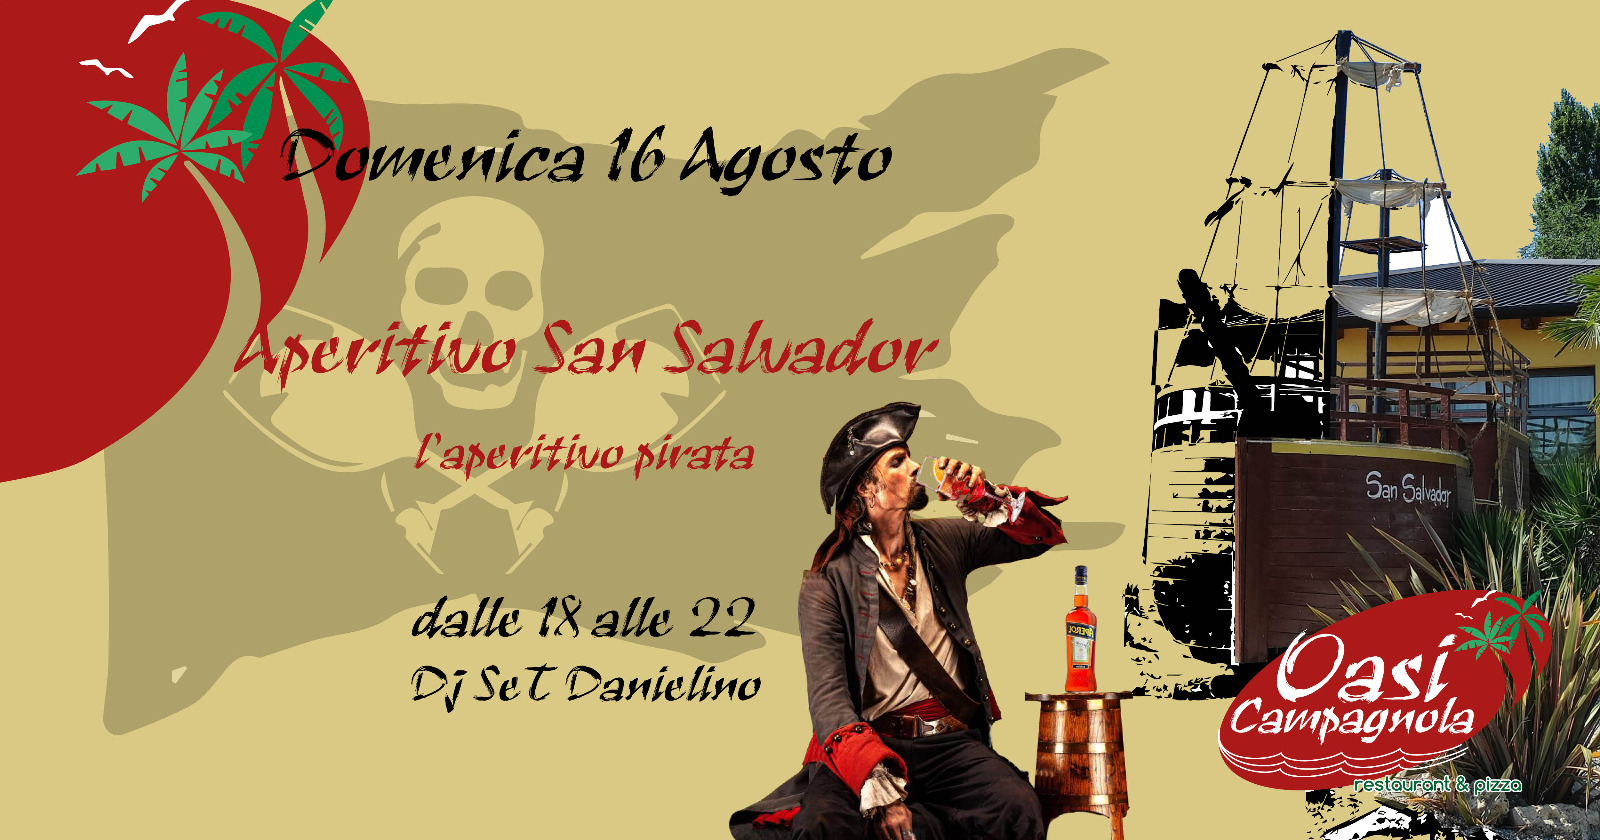 oasicampagnola_16_ago_aperitivo_san_salvador